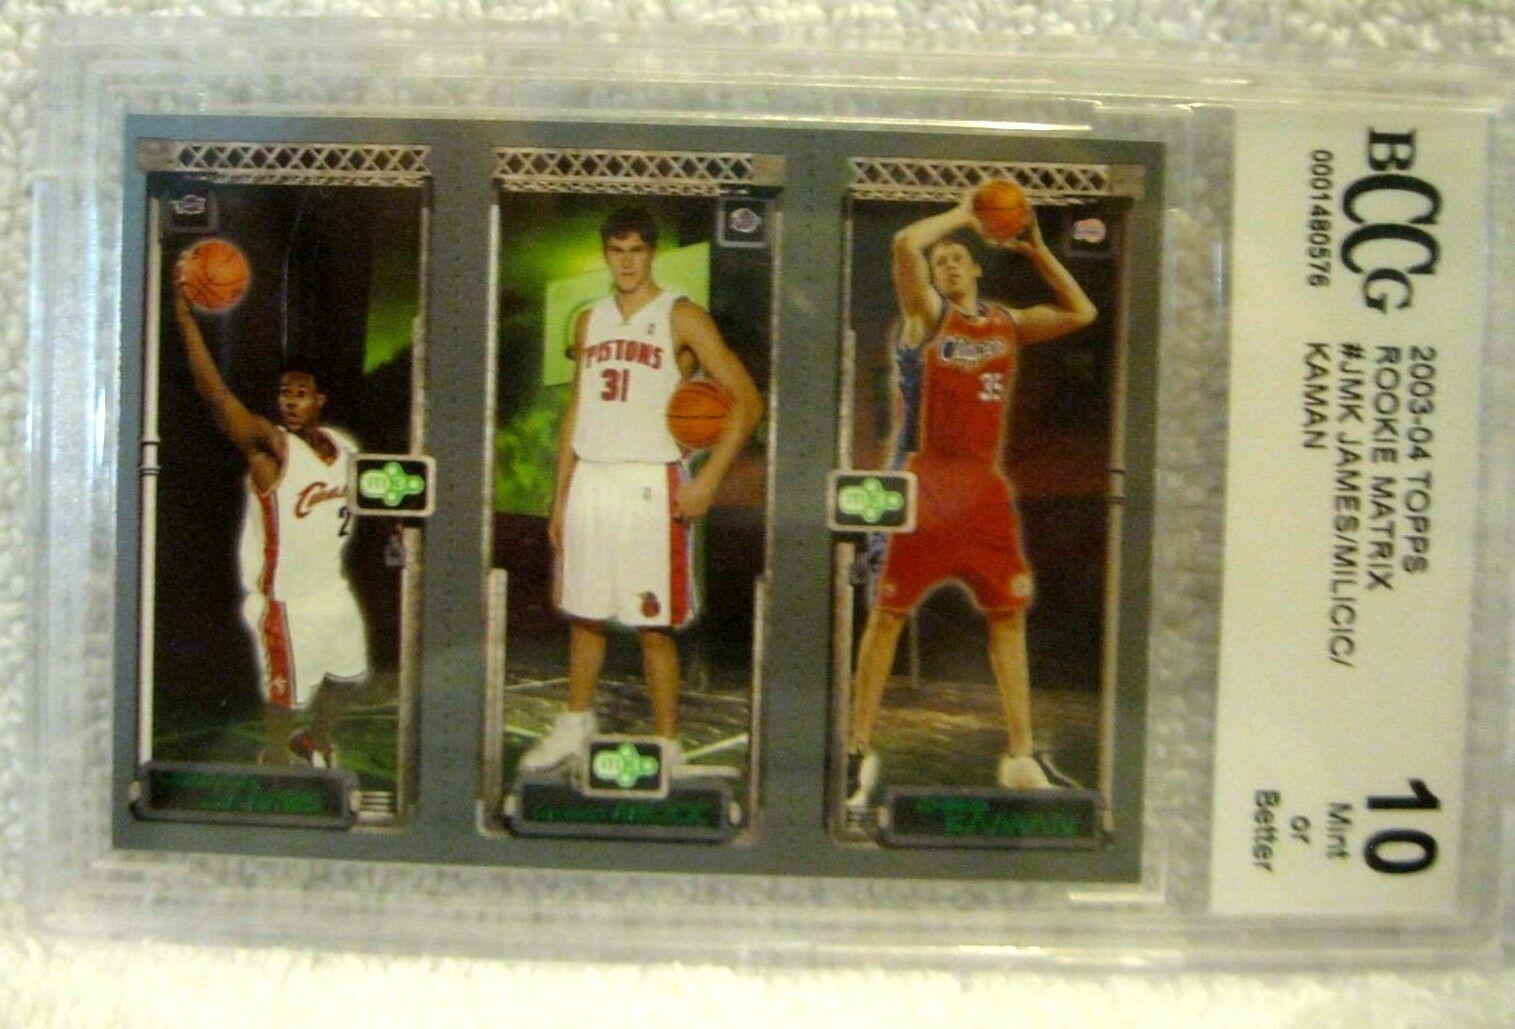 Lebron James RC 2004 Fleer USA Rookie Card GEM BGS 9.5! Cavaliers RC image 2